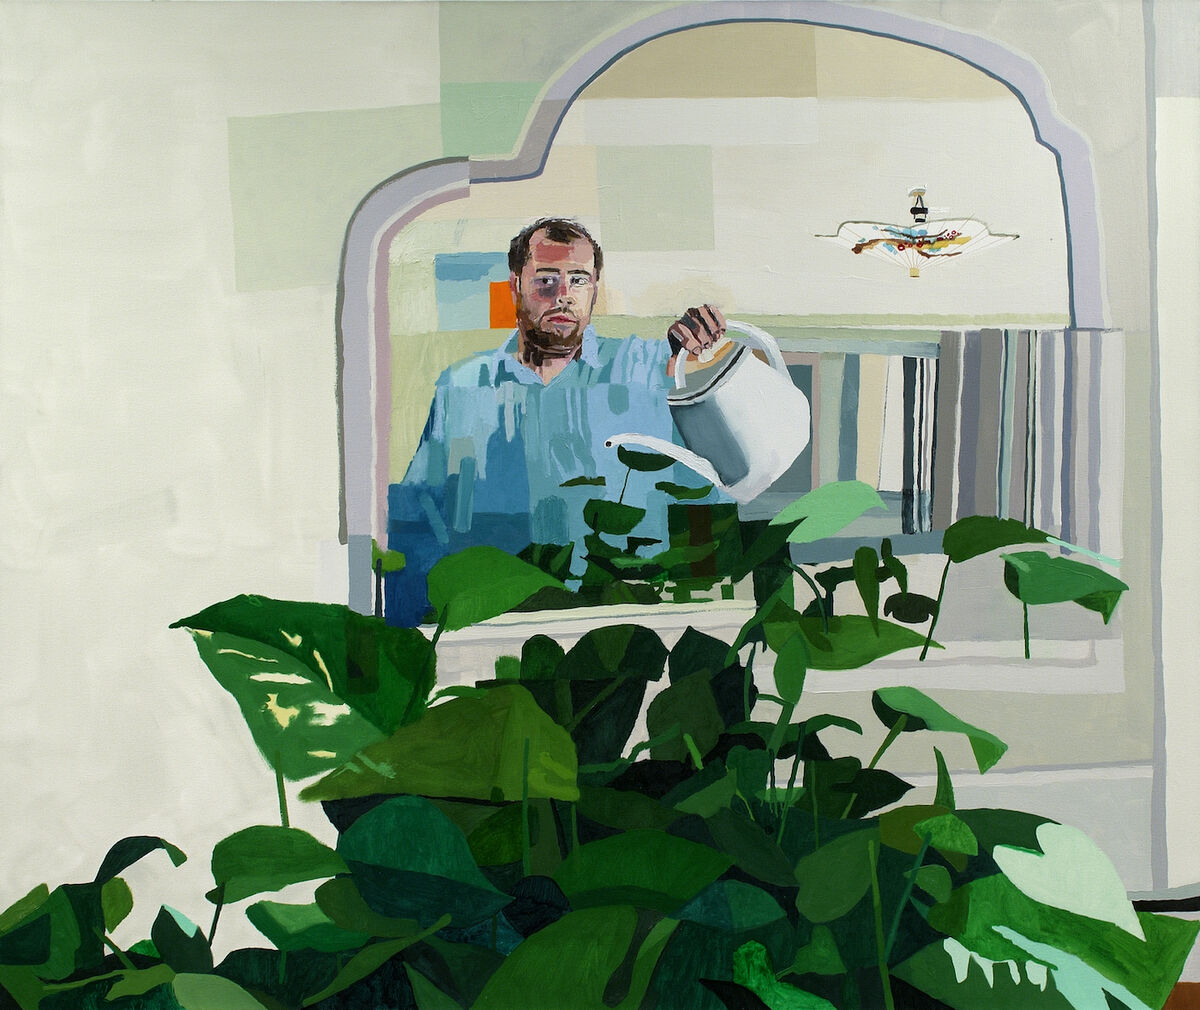 Jonas Wood, Untitled (Self Portrait), 2006. © Jonas Wood. Courtesy of the artist and Black Dragon Society.